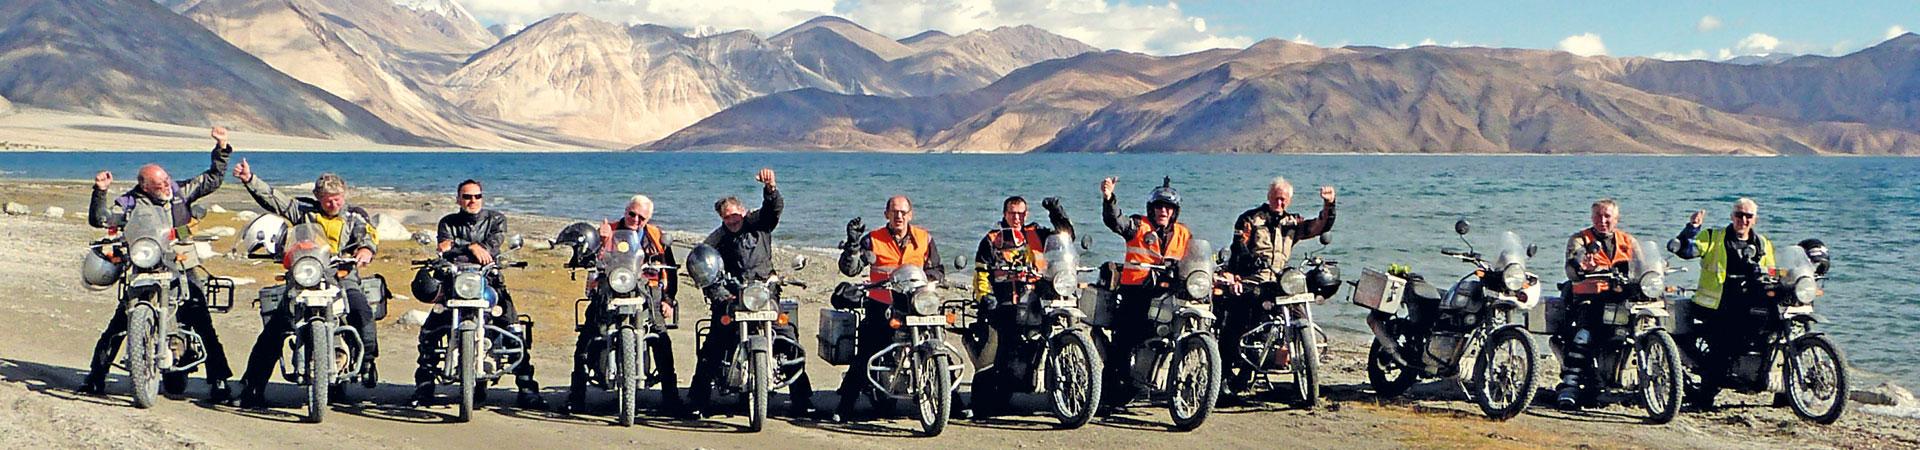 Titelbild-Gruppenreise-Himalaya_31-07-2019_a36ae